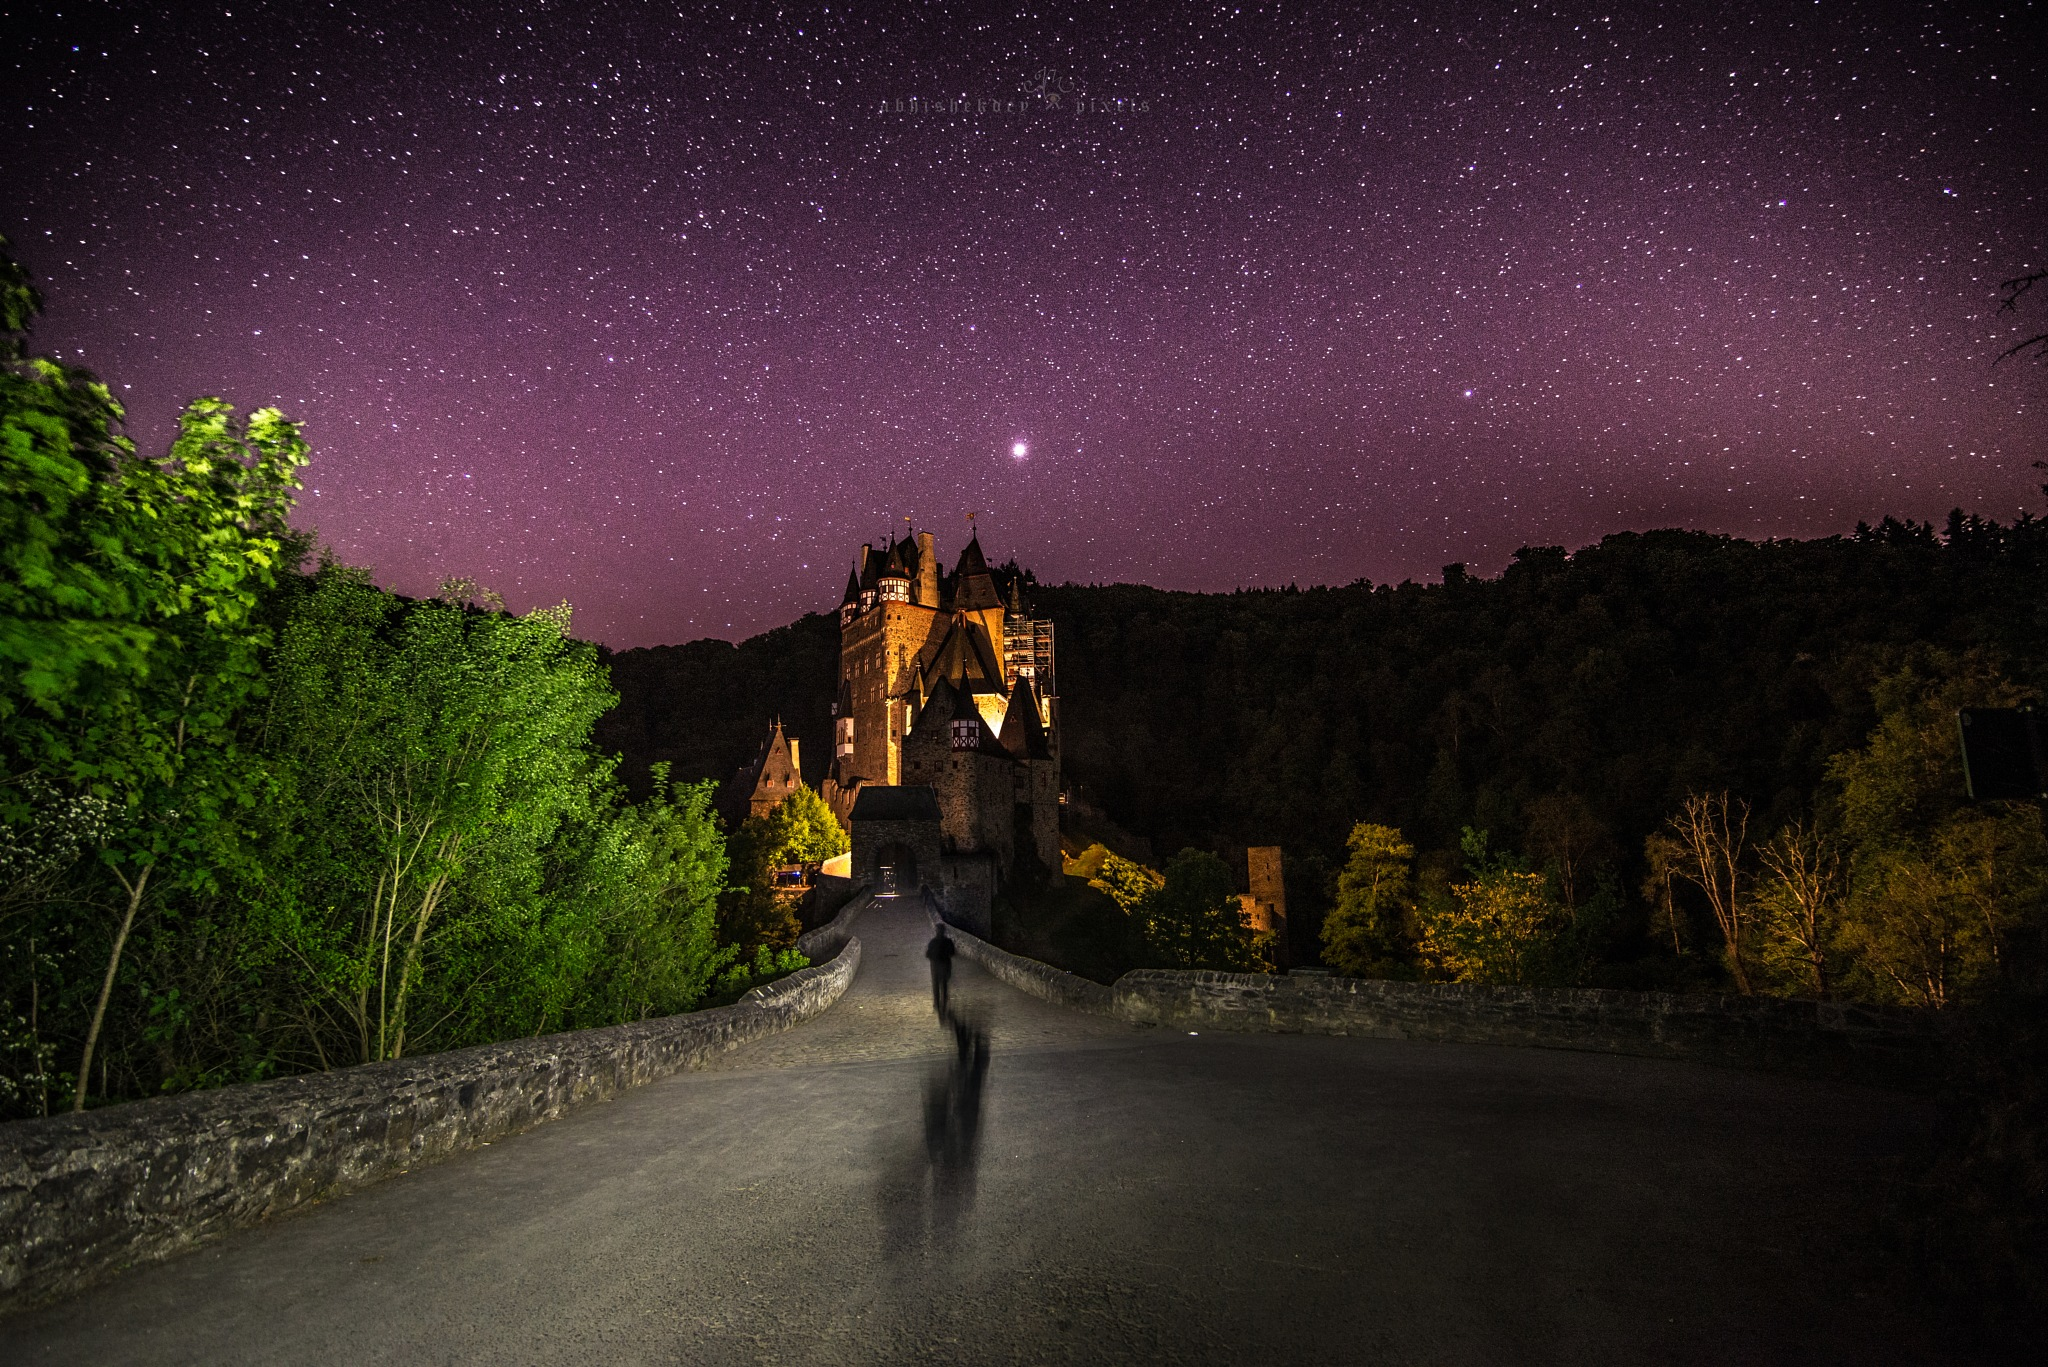 When my Spirit leaves me to a Fairyland by Abhishek Dey